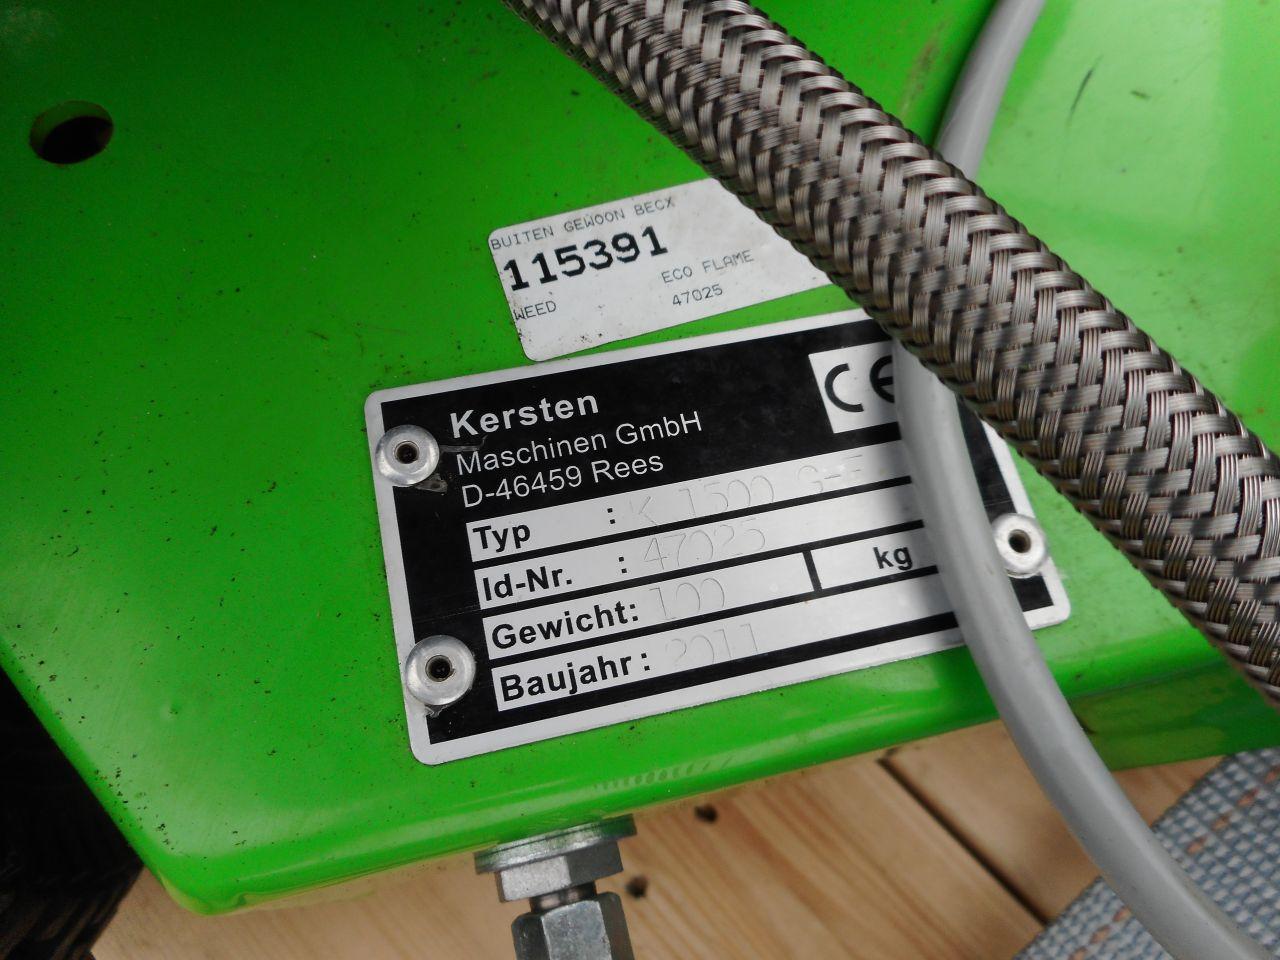 Weedcontrol air combi compact